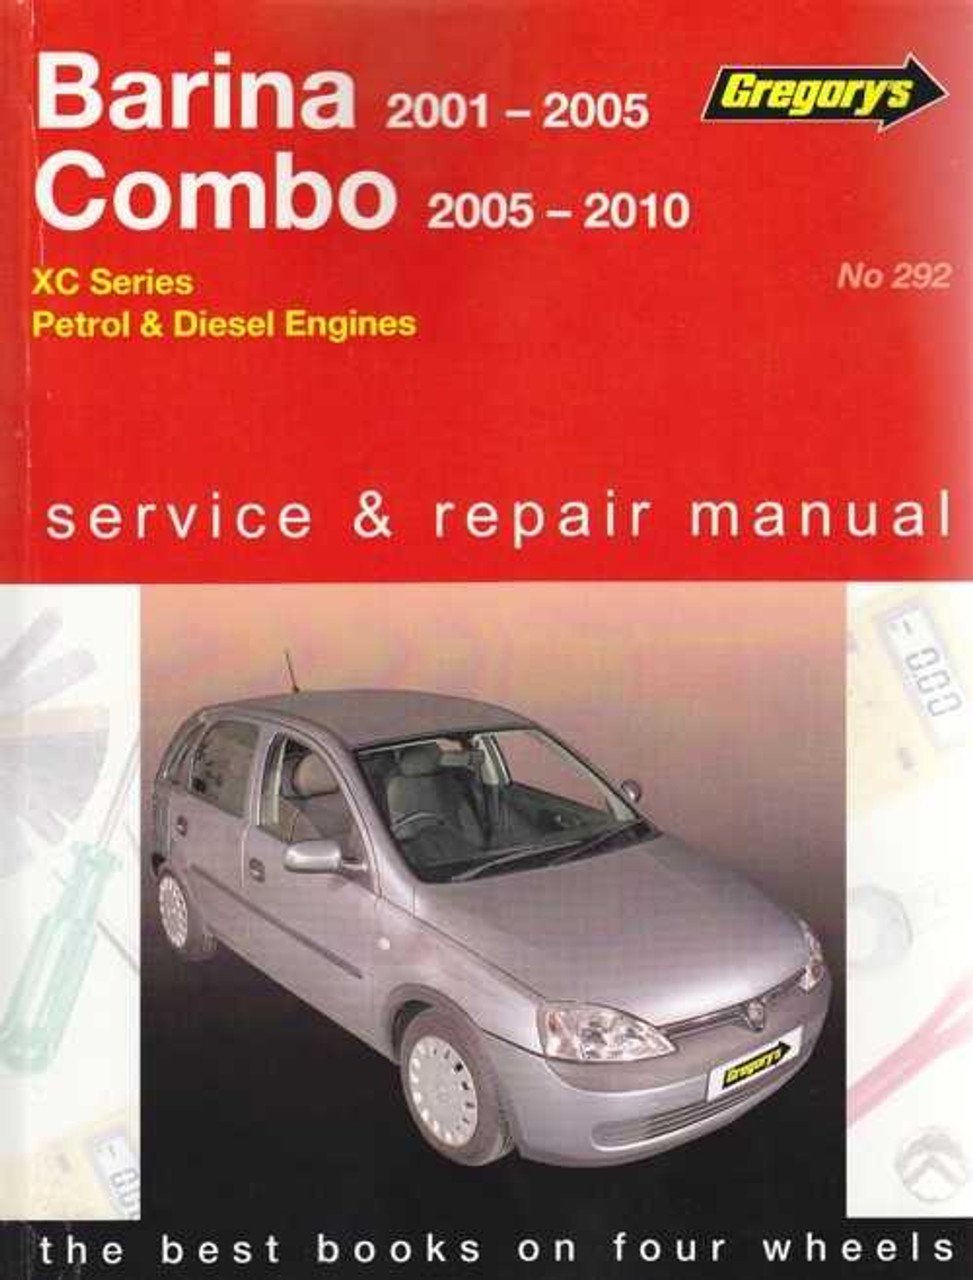 holden barina combo xc series petrol diesel 2001 2010 workshop rh automotobookshop com au White Holden Barina 1985 Holden Barina